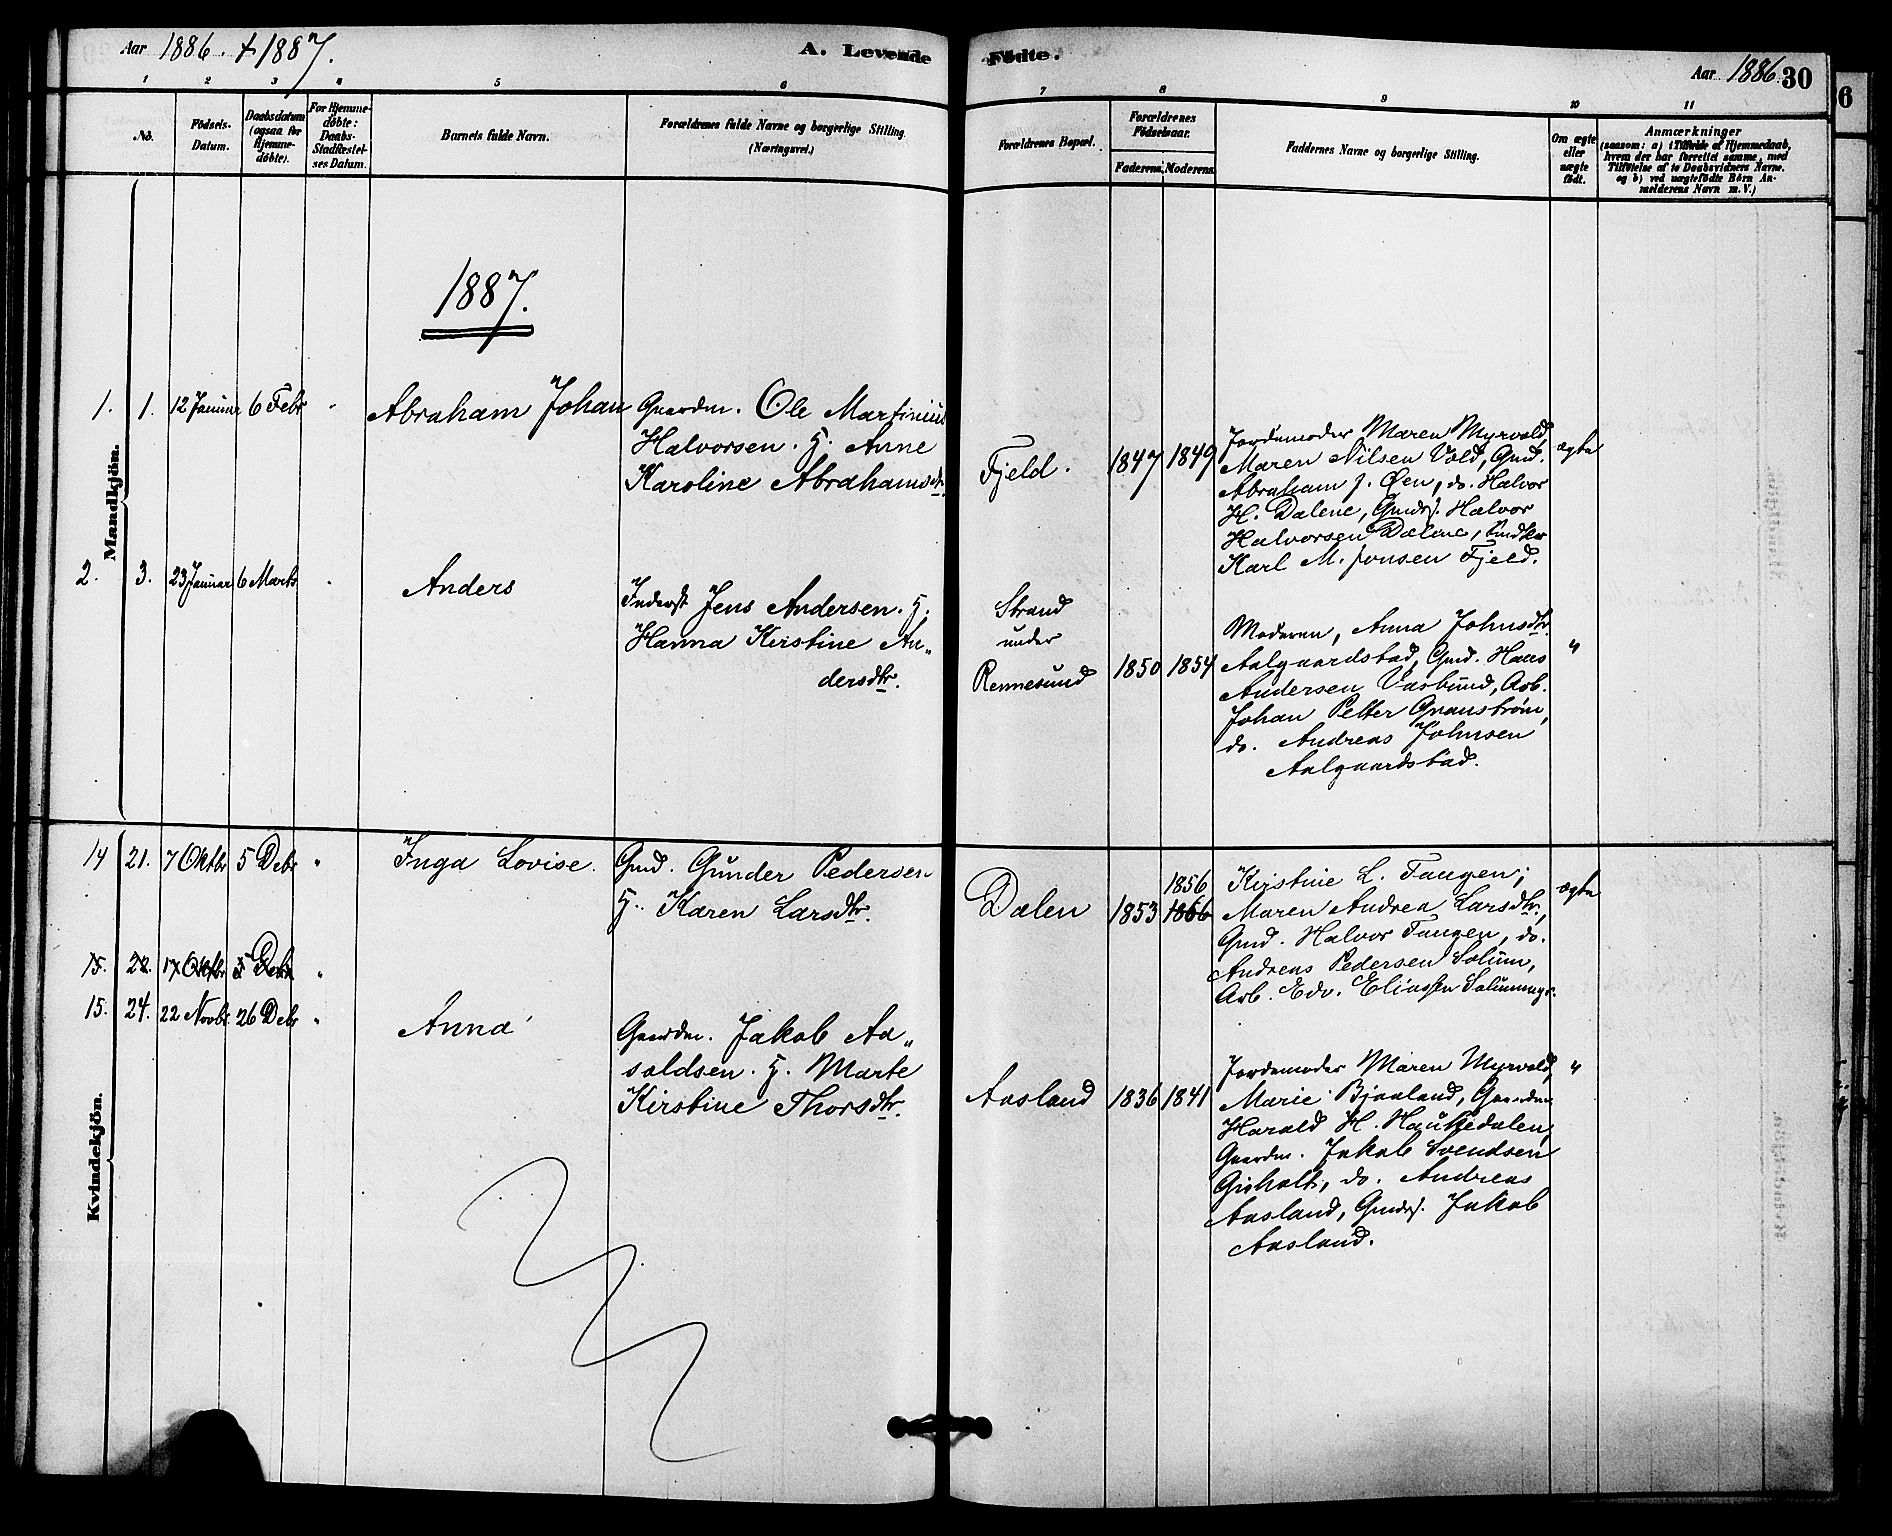 SAKO, Solum kirkebøker, F/Fc/L0001: Ministerialbok nr. III 1, 1877-1891, s. 30